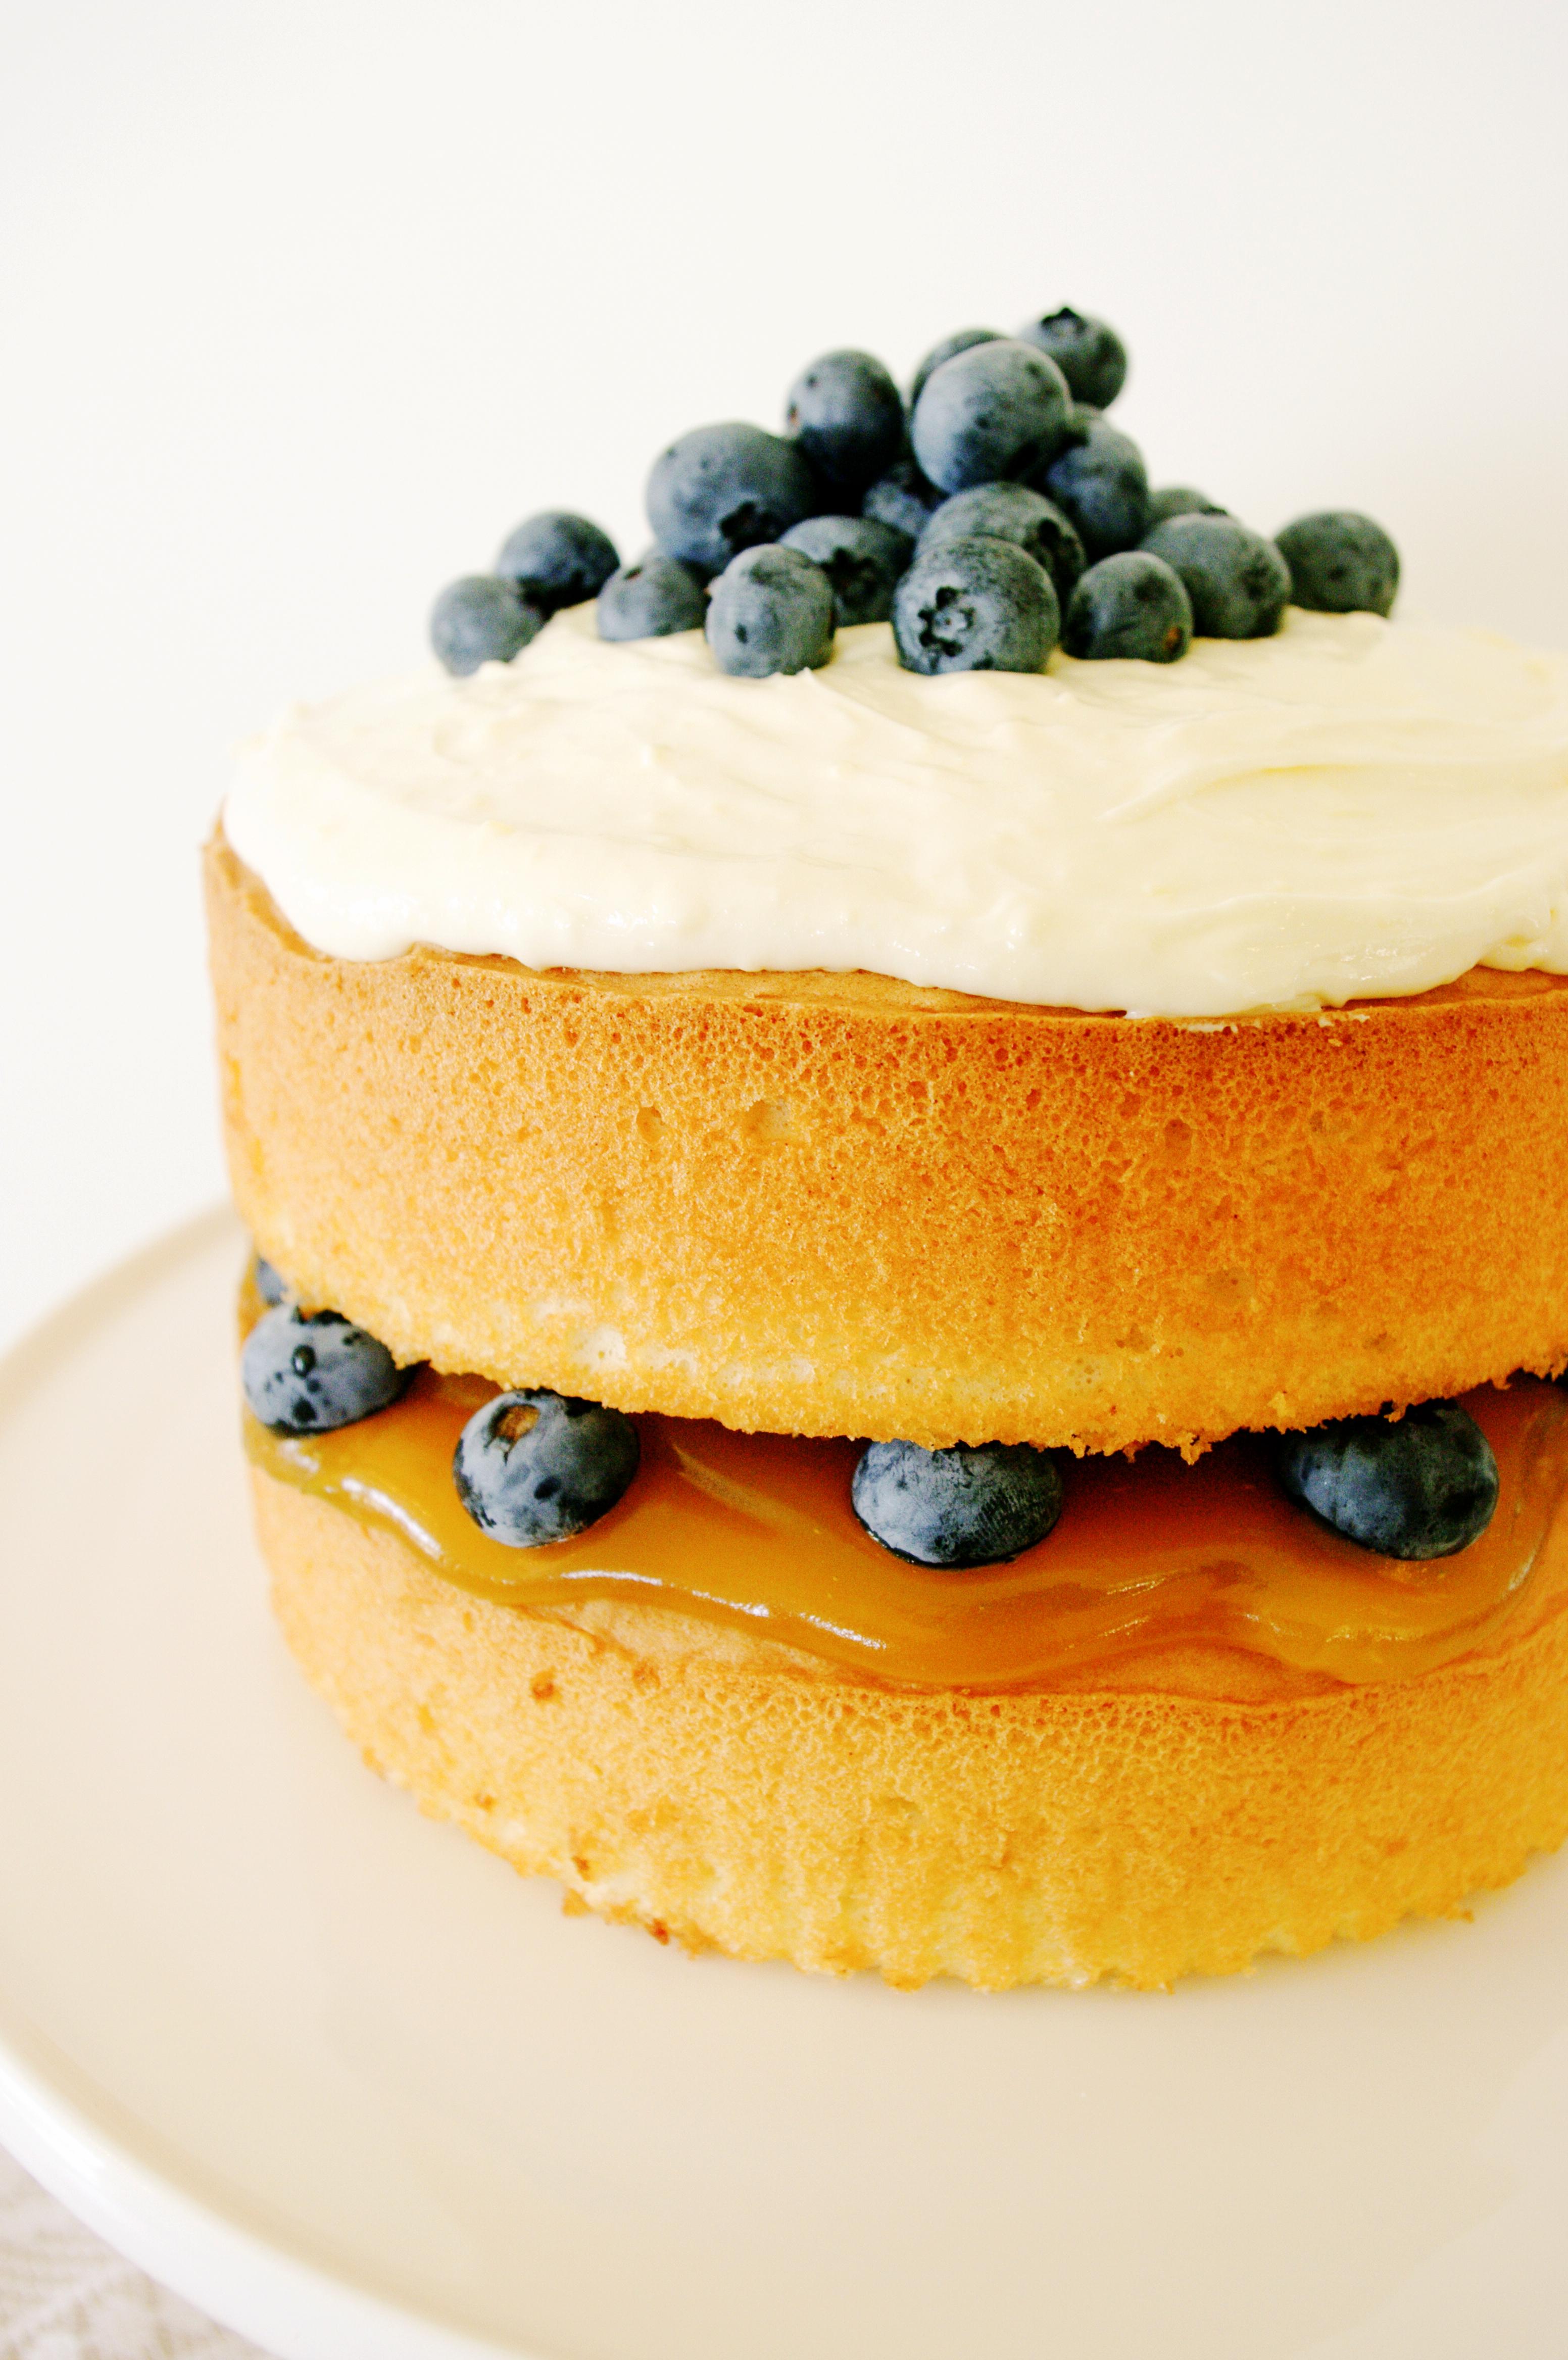 Layered Lemon Sponge Cake Recipe